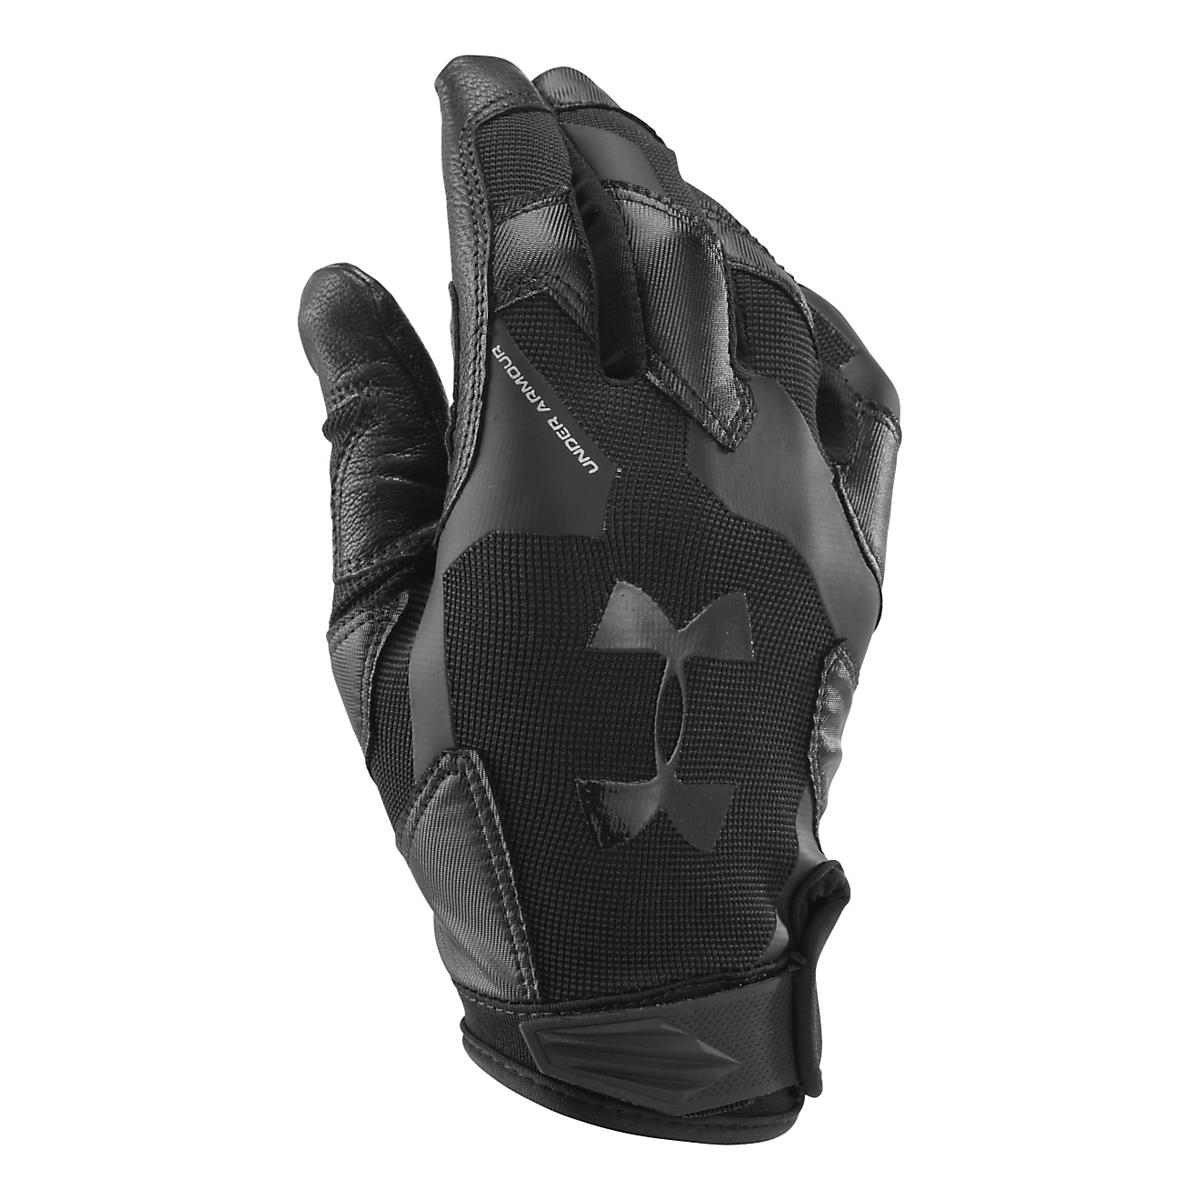 Mens nike leather gloves - Mens Nike Leather Gloves 44